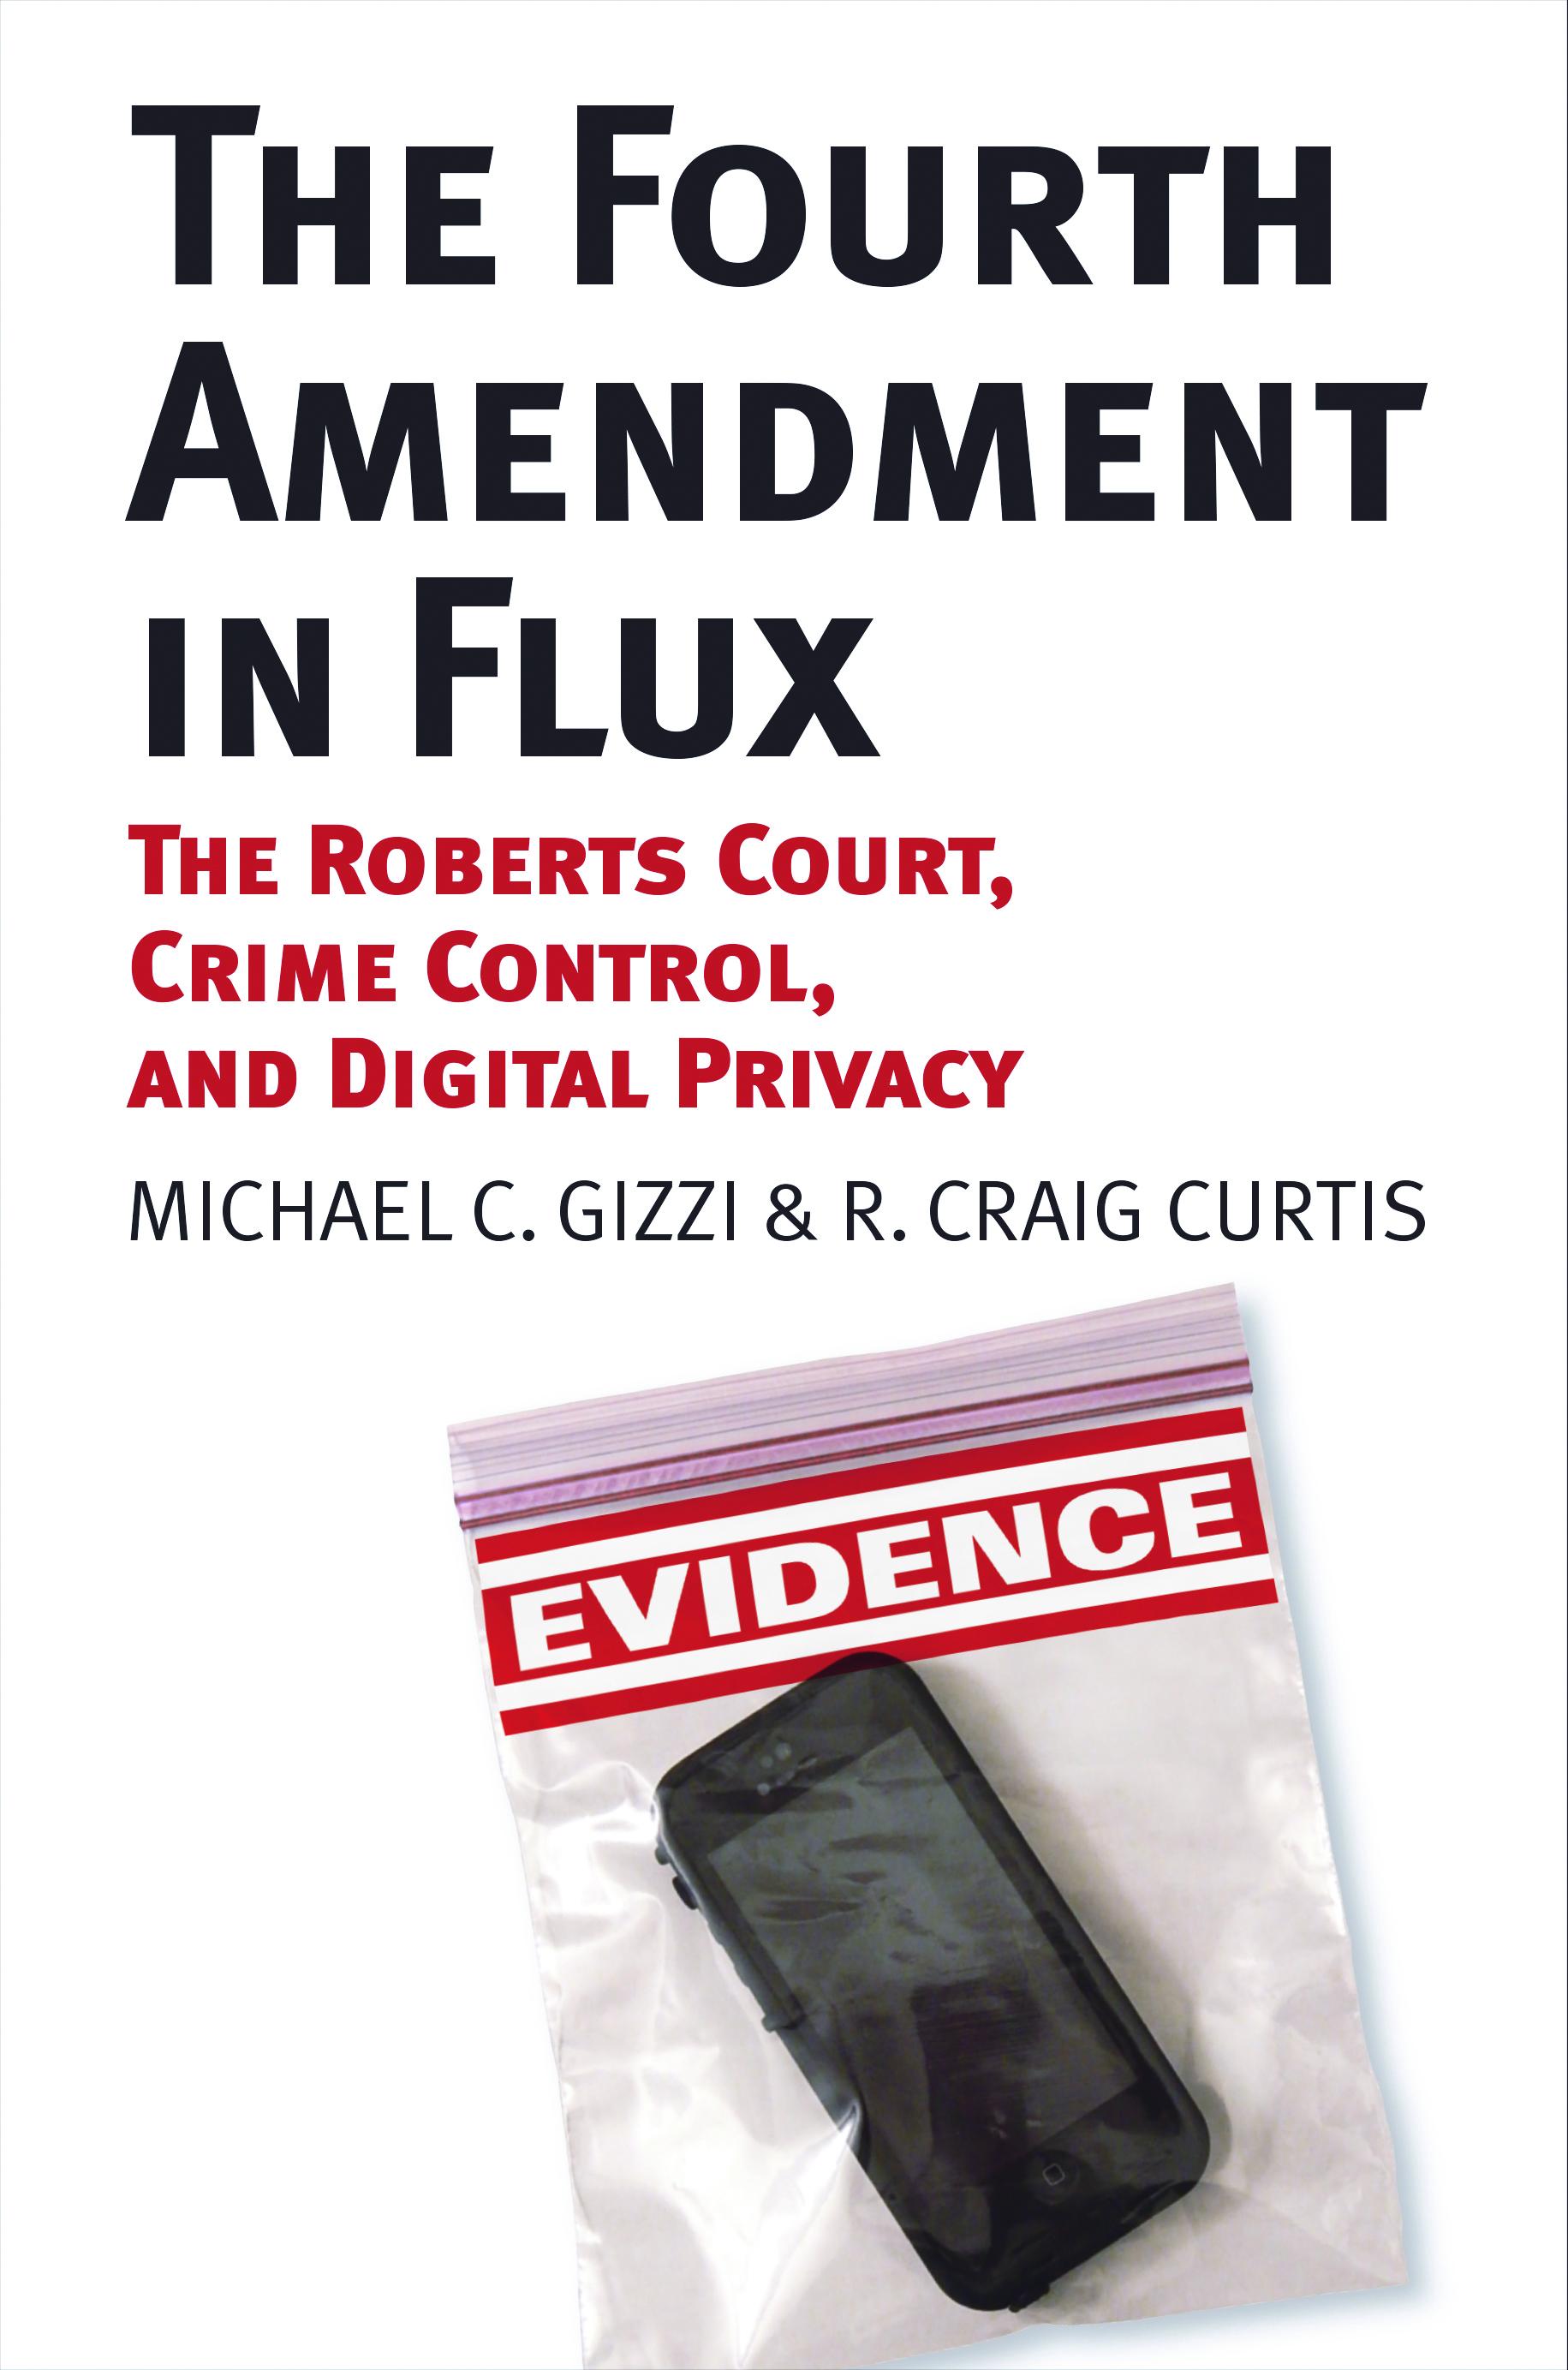 cover of Gizzi book